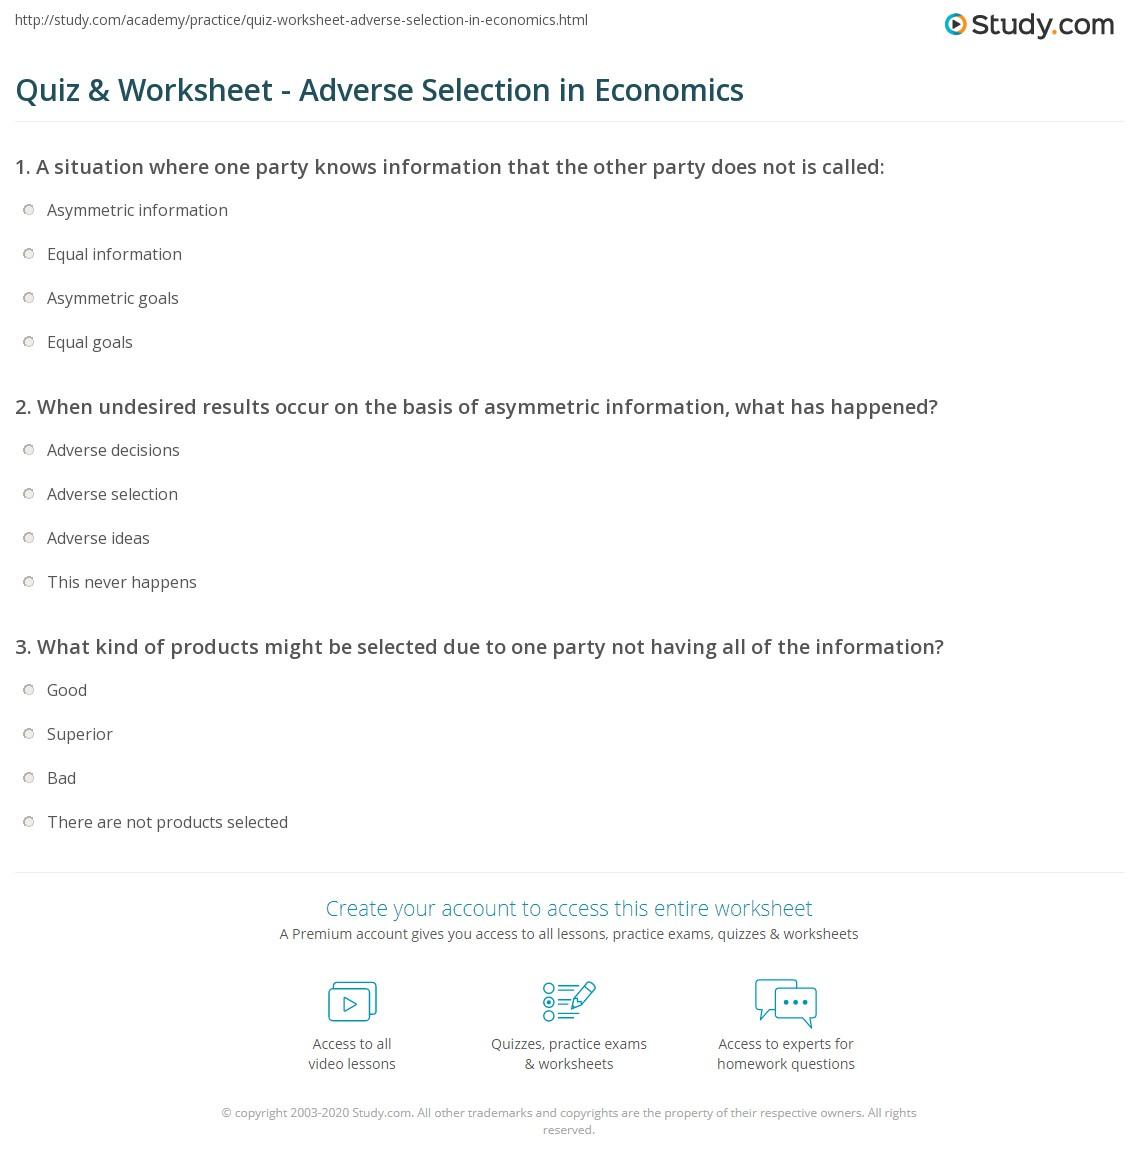 Quiz Worksheet Adverse Selection In Economics Study